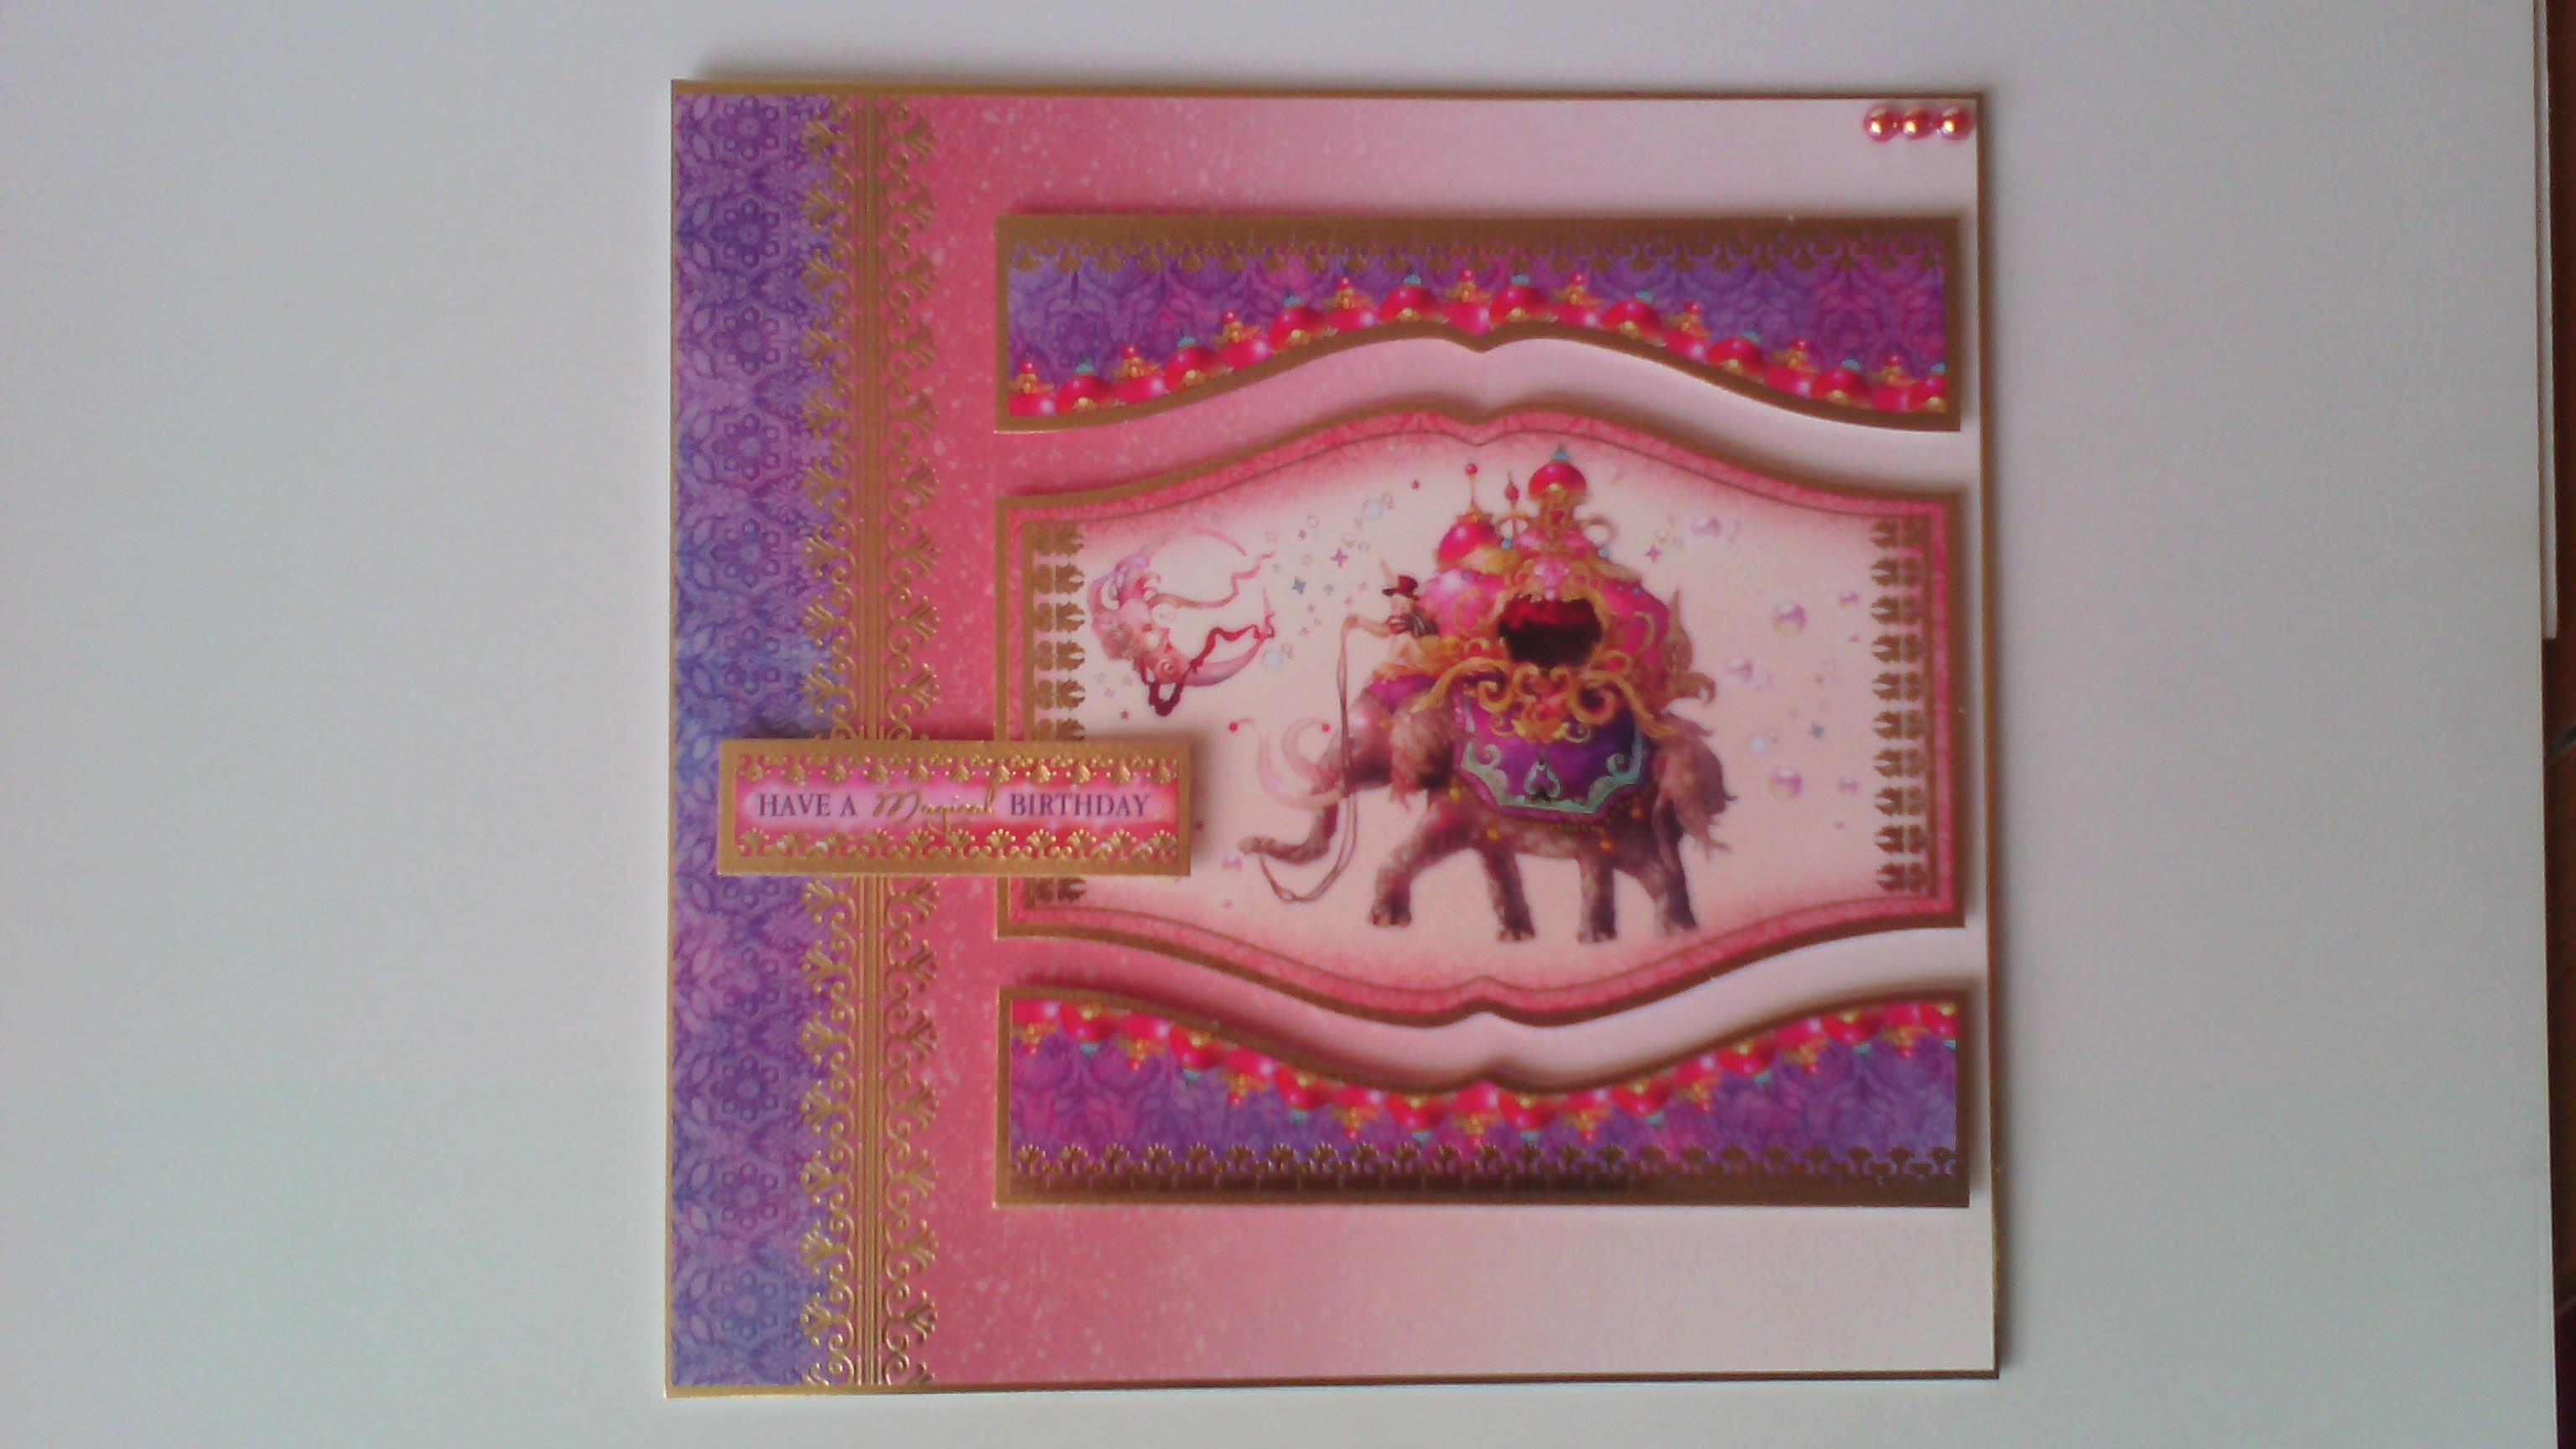 Mystical happy birthday luxury 8x8 handmade greeting card on storenvy img 20160419 173559 original m4hsunfo